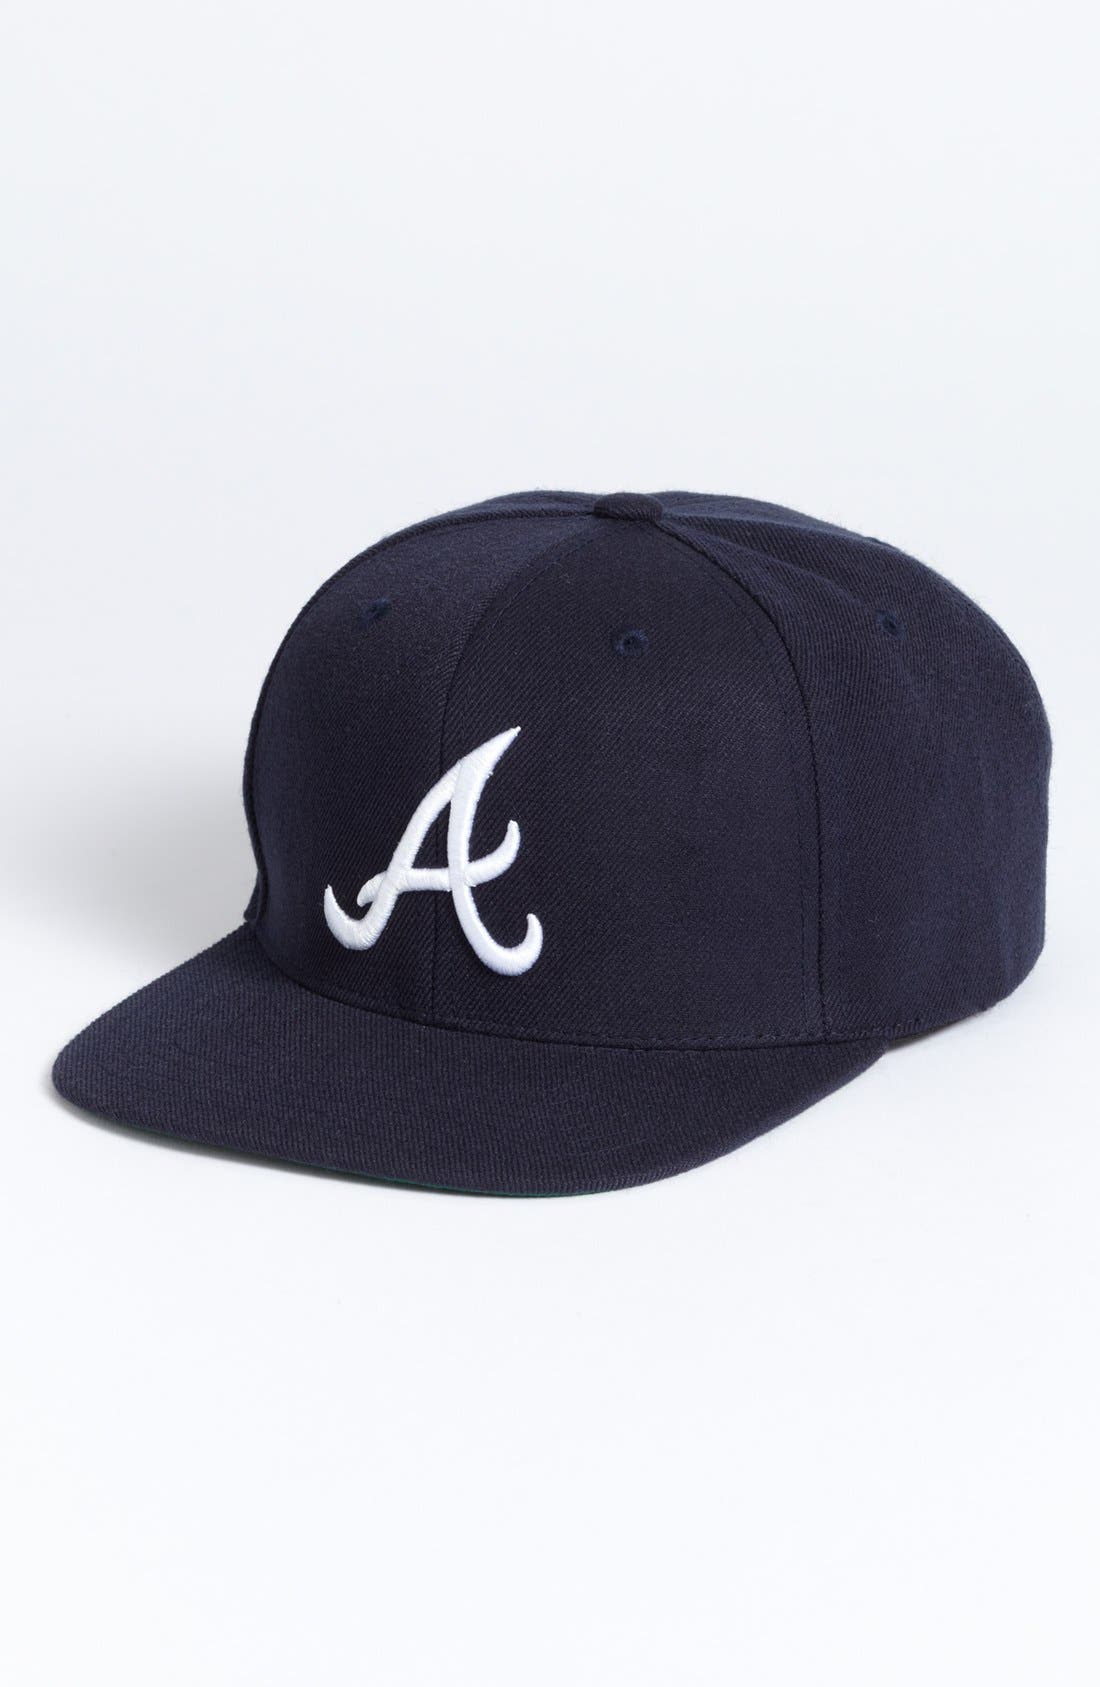 Alternate Image 1 Selected - American Needle 'Atlanta Braves - 400 Series' Snapback Baseball Cap